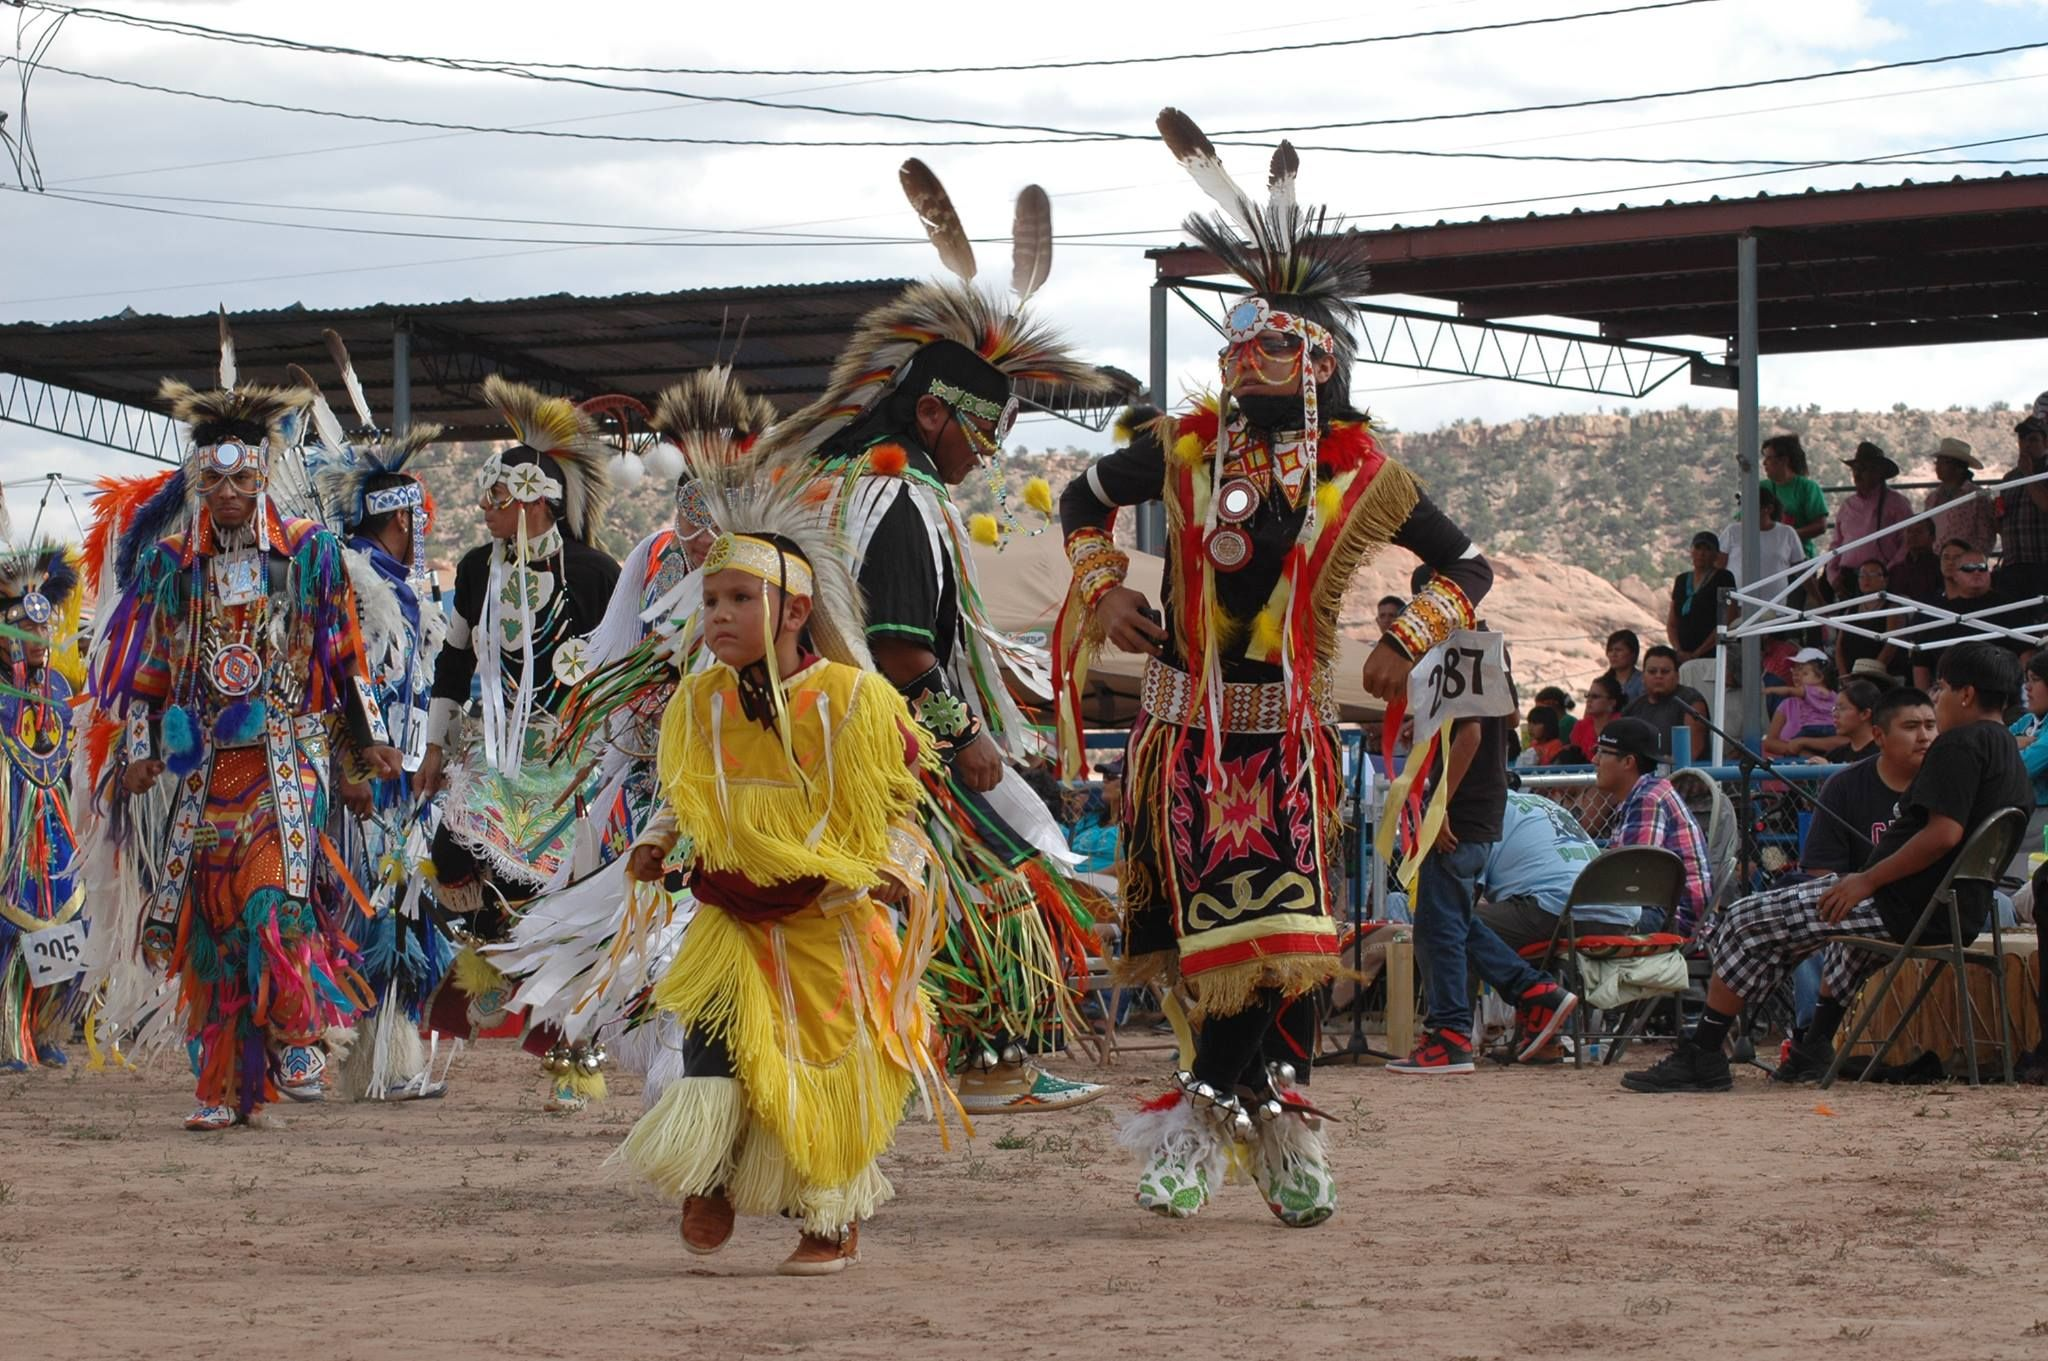 Navajo Nation Fair, 2013 Navajo nation, Navajo, Navajo